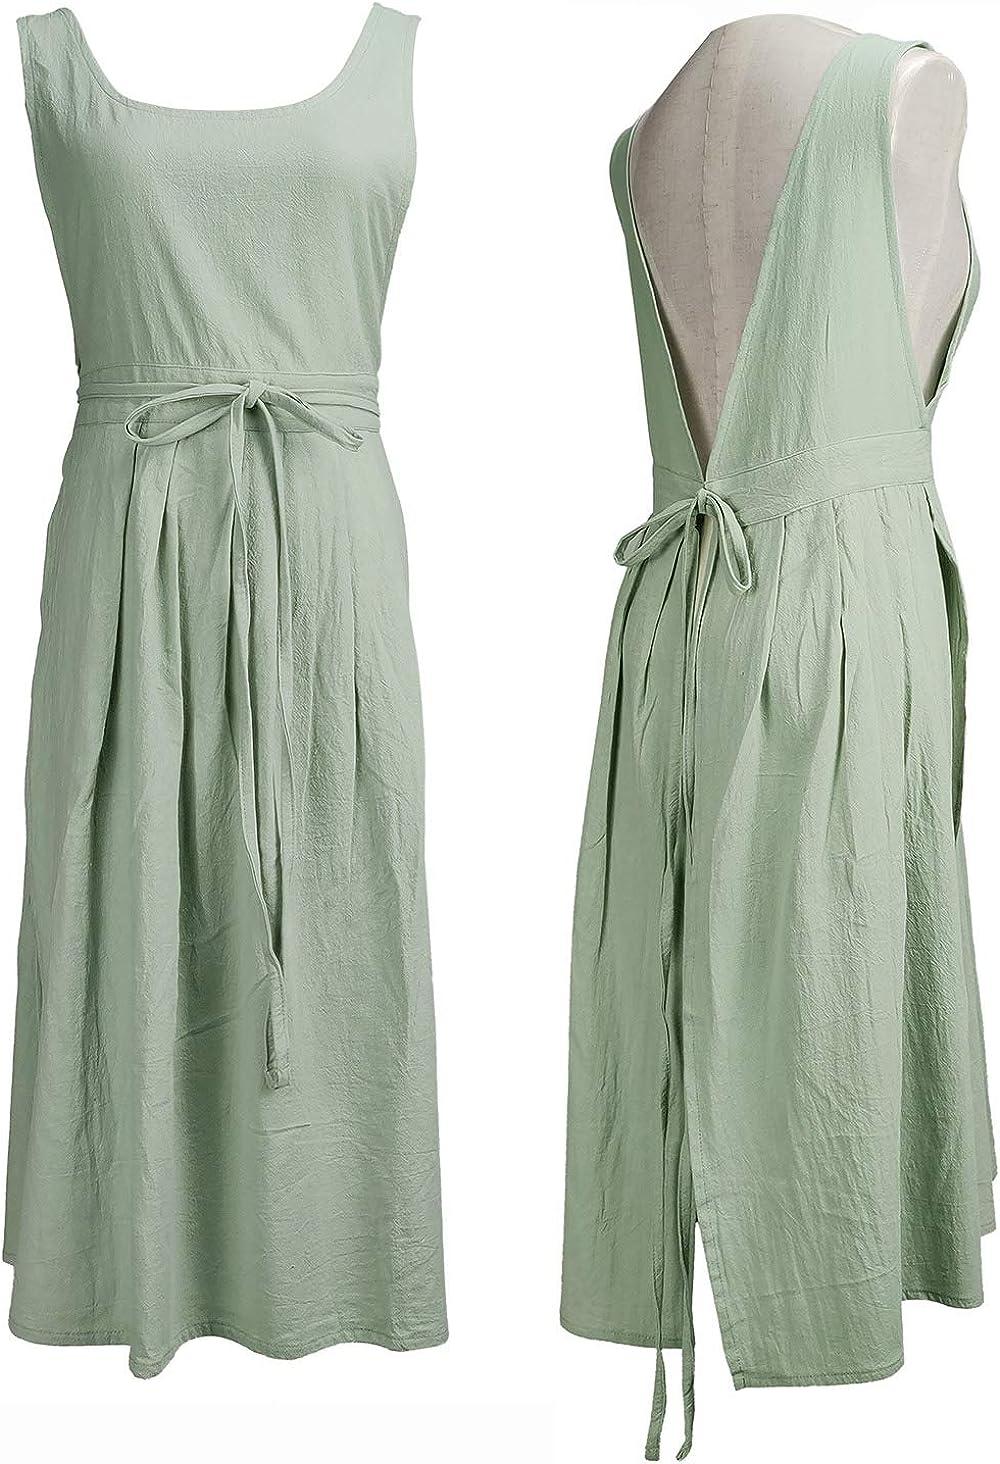 Women Girls Vintage Pleated Split Apron V Neck Gardening Works Cotton Overall Smock Pinafore Dress